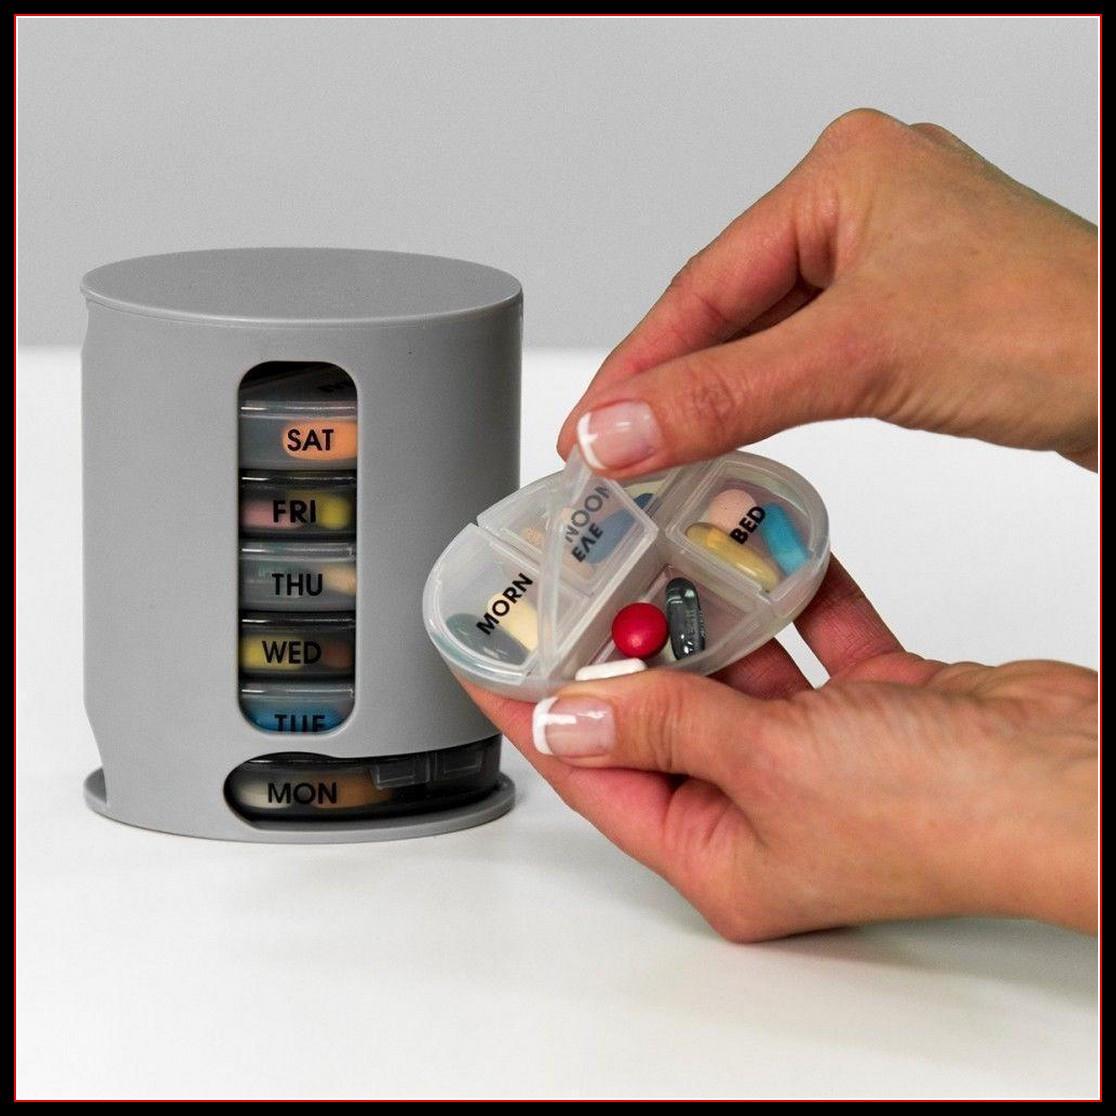 Органайзер для хранения таблеток на 7 дней Pill Pro